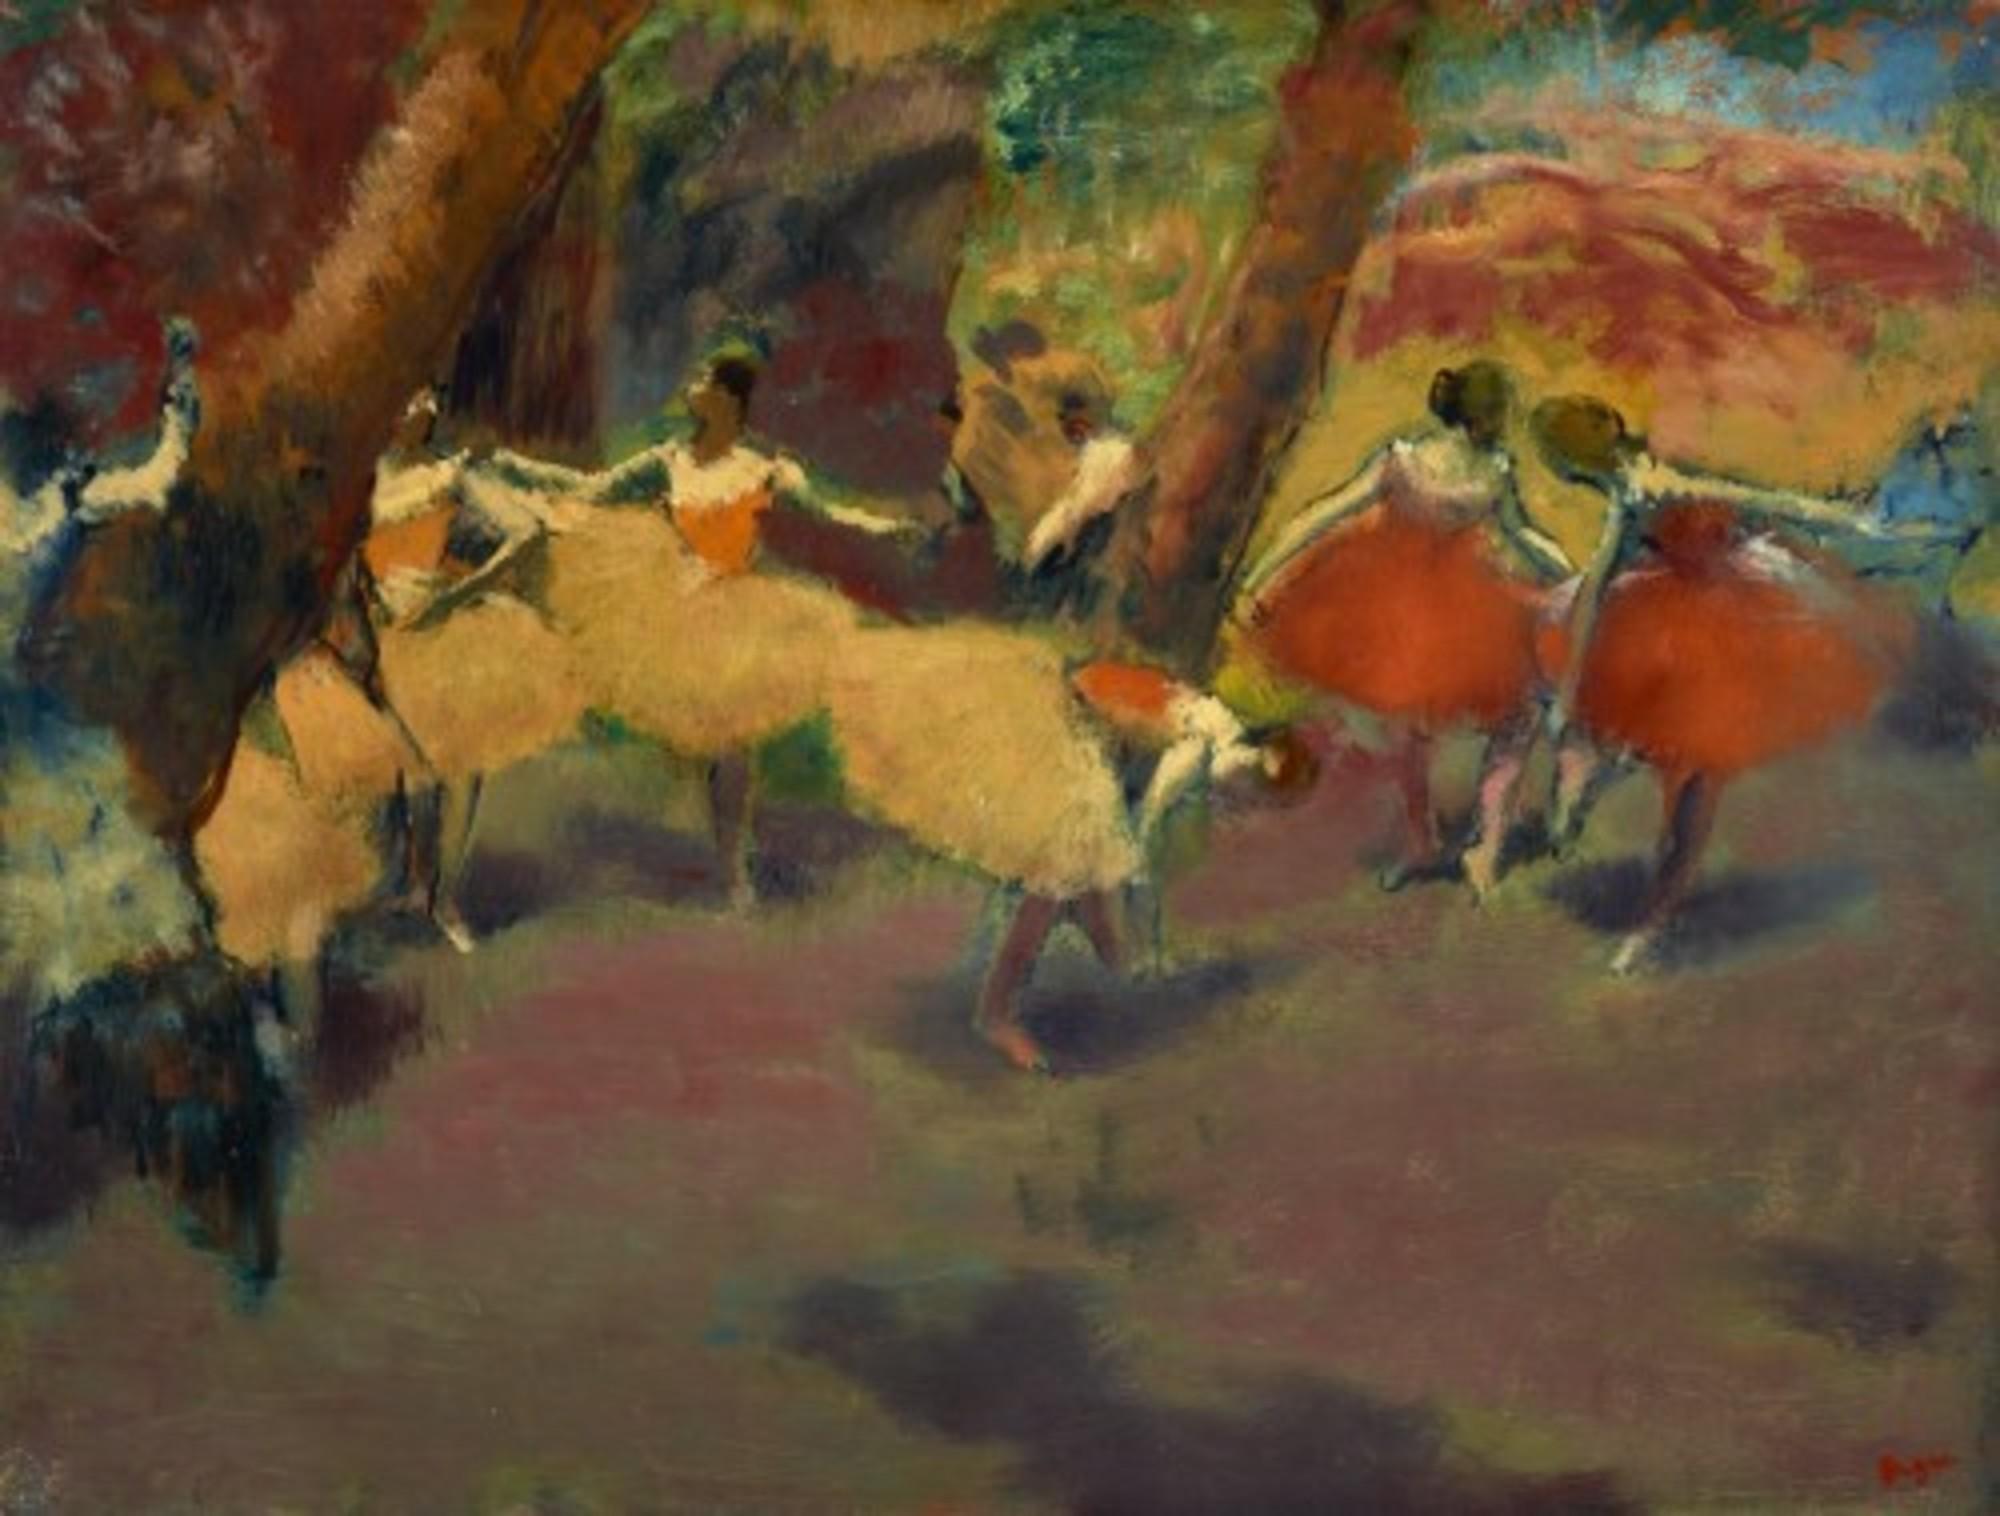 Edgar-Degas---Before-the-Performance---Google-Art-Project.jpg